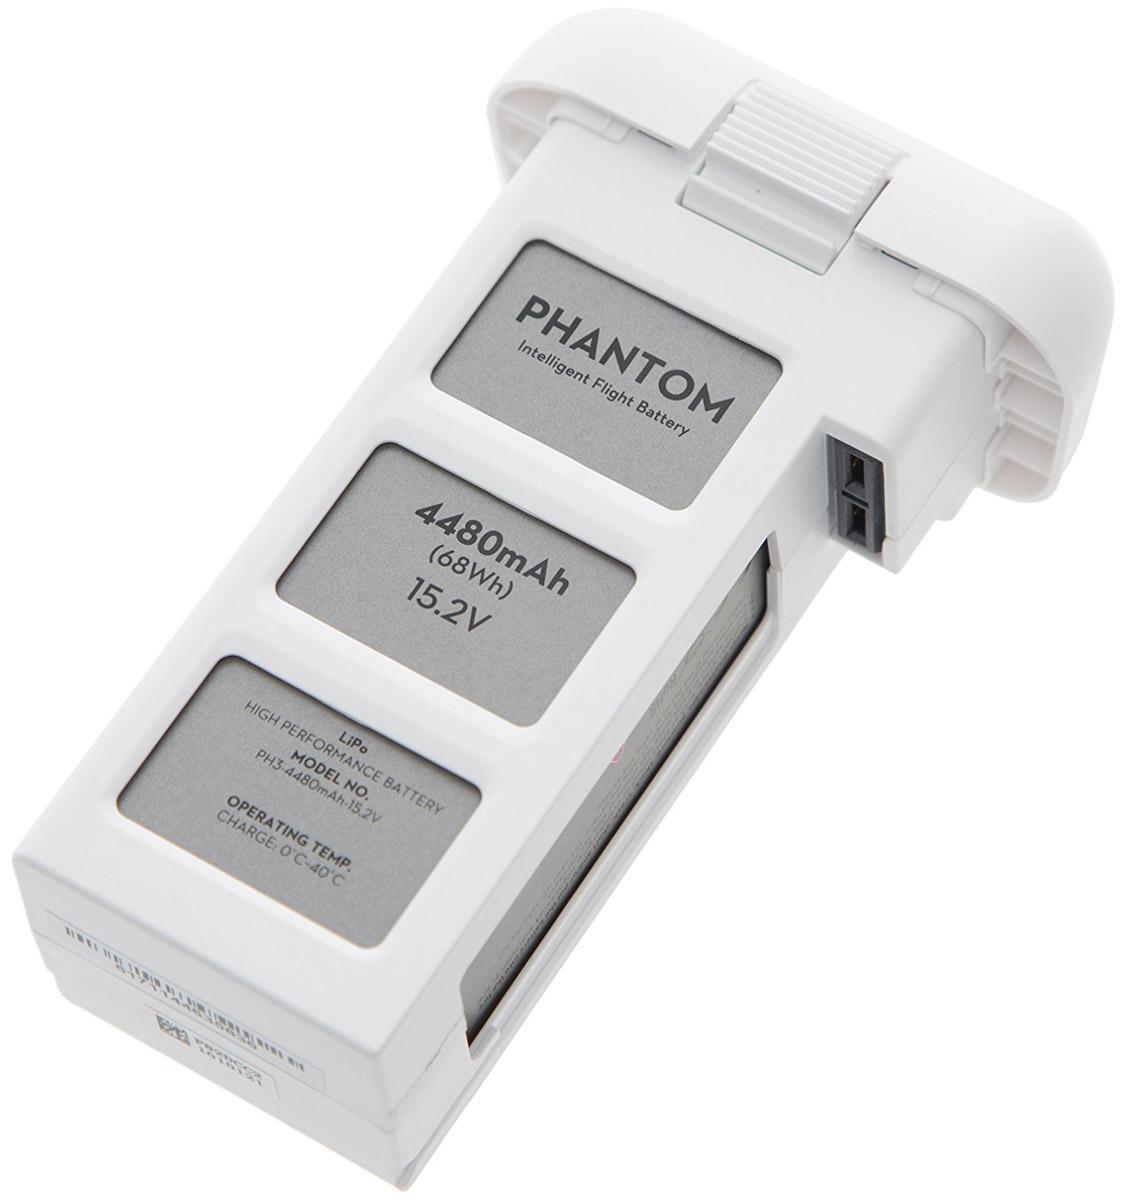 DJI Аккумуляторная батарея для квадрокоптера Phantom 3